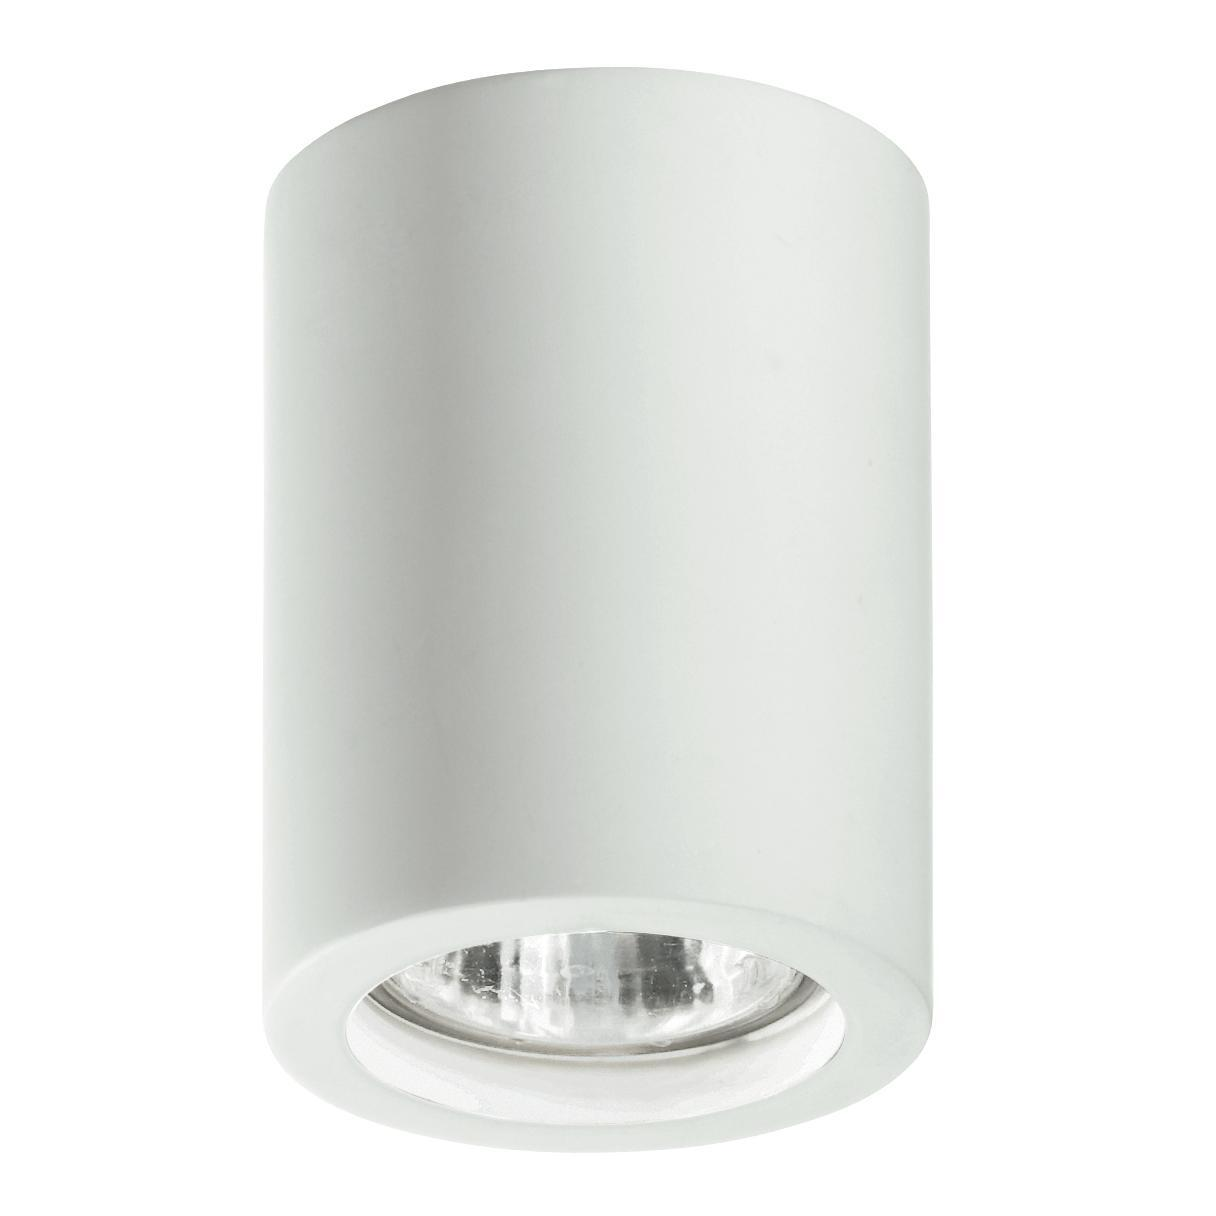 Plafoniera design Space bianco, in gesso, D. 7 cm 7x7 cm, INTEC - 1